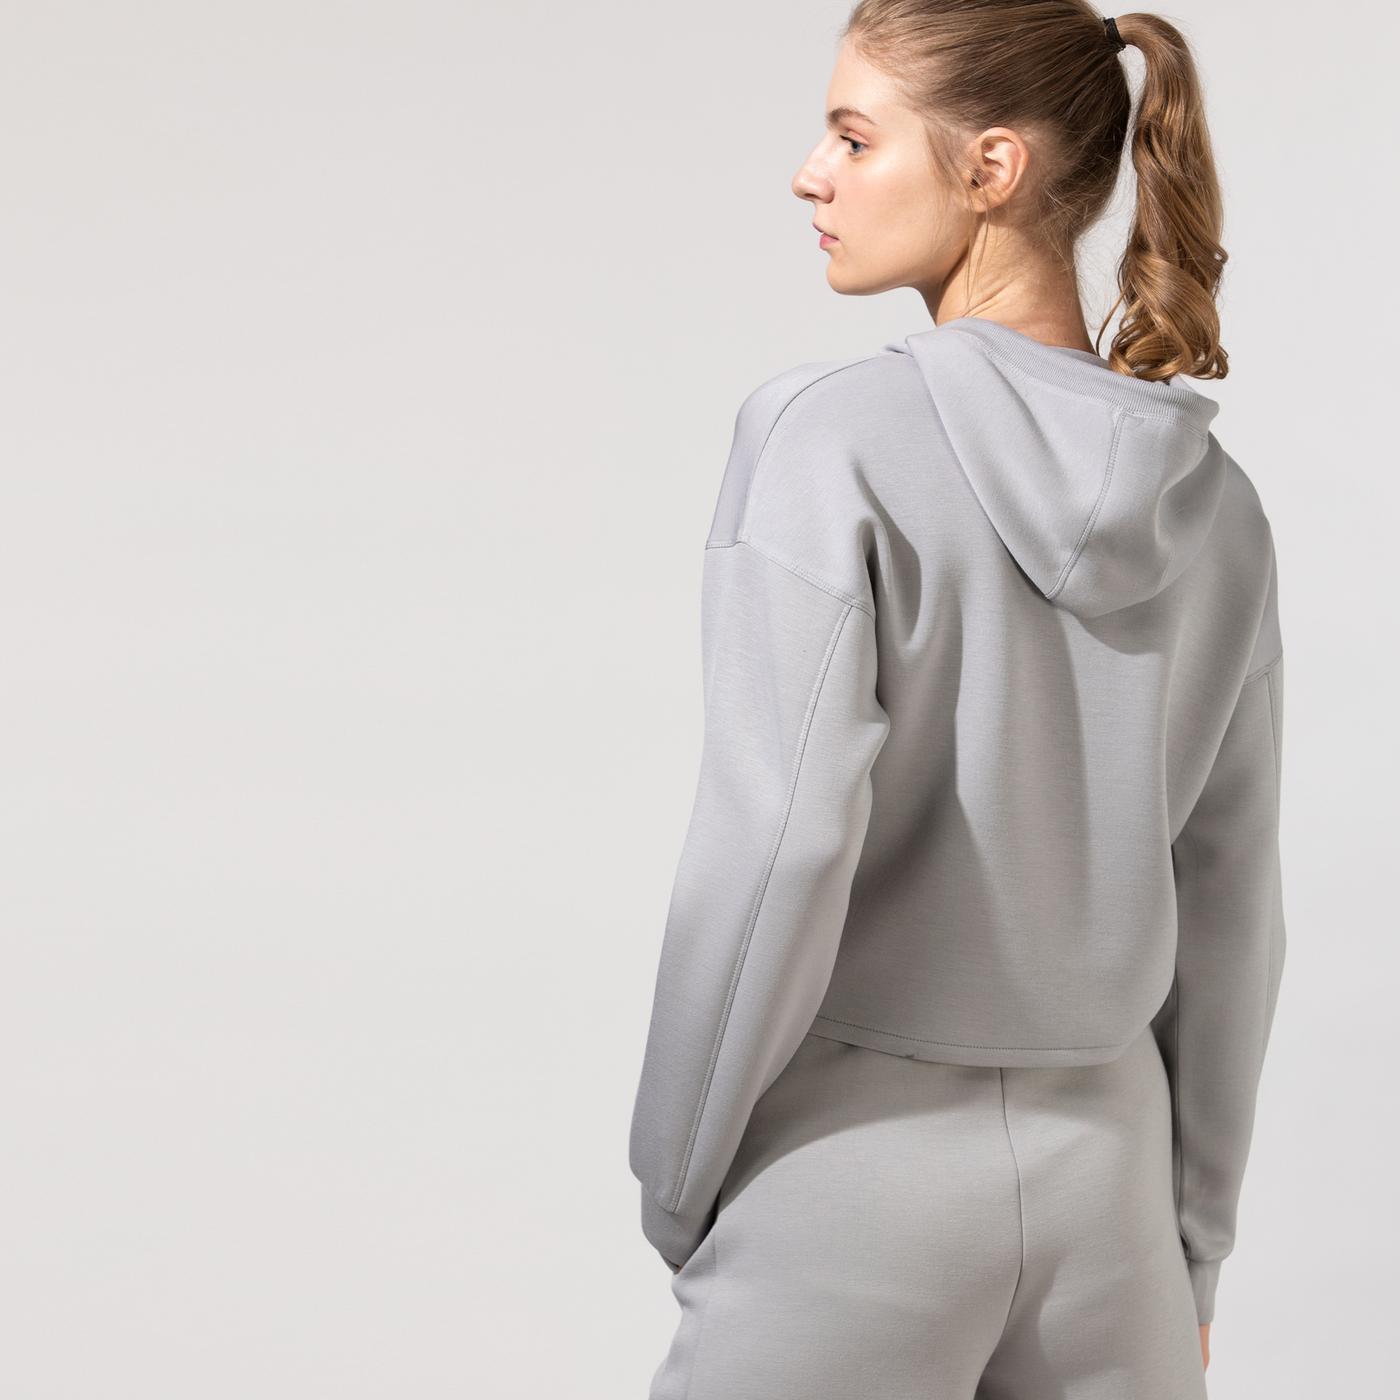 Guess Kadın Gri Sweatshirt